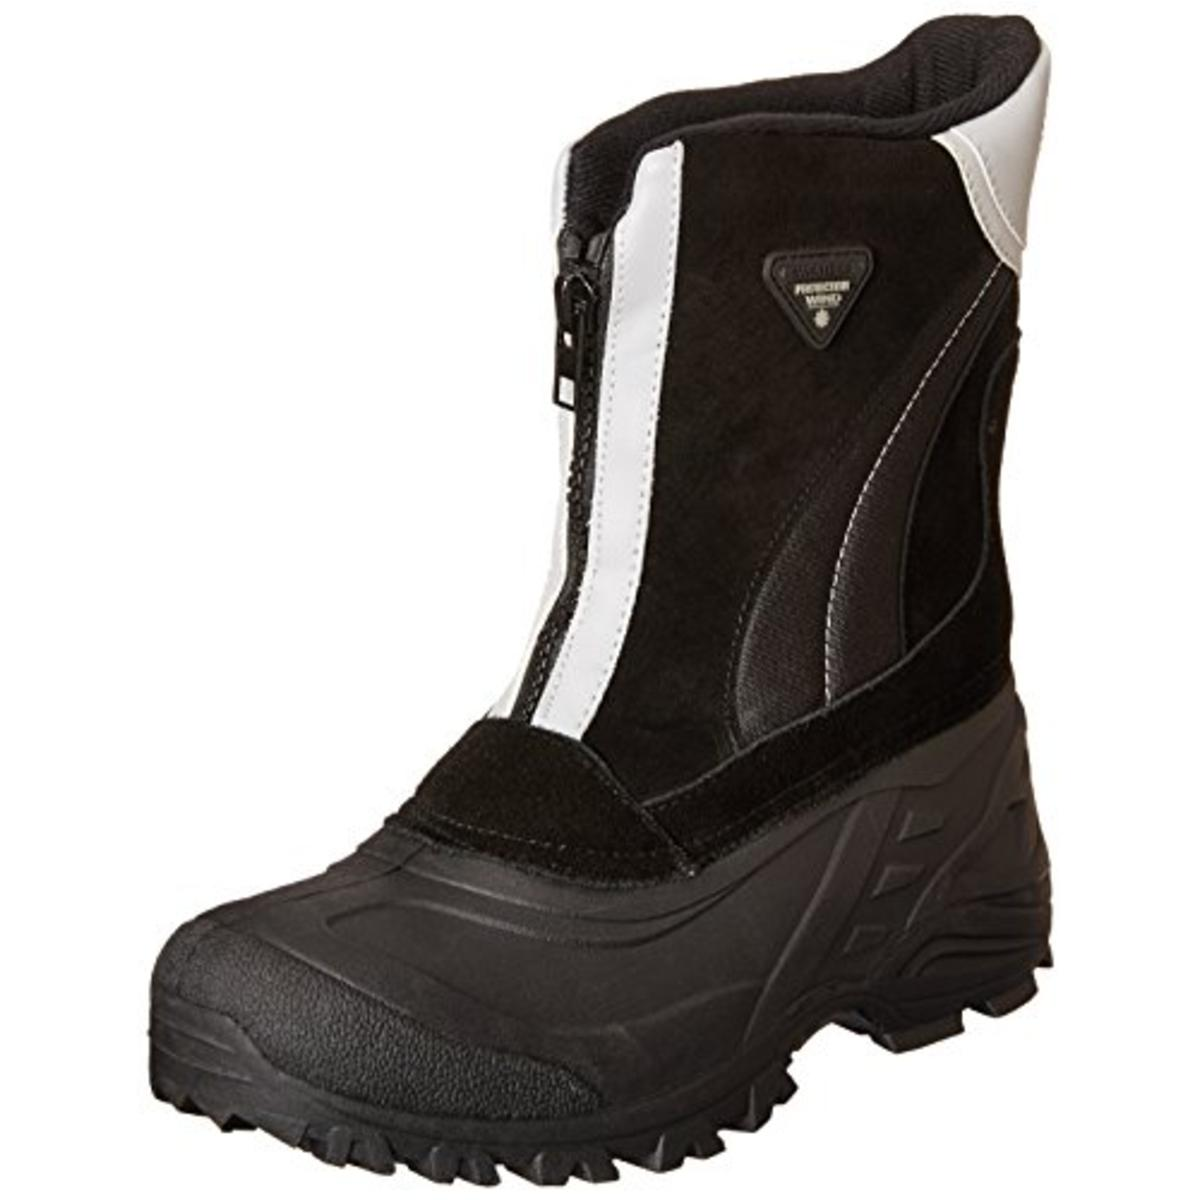 Totes 9401 Mens Jorge Black Suede Waterproof Snow Boots